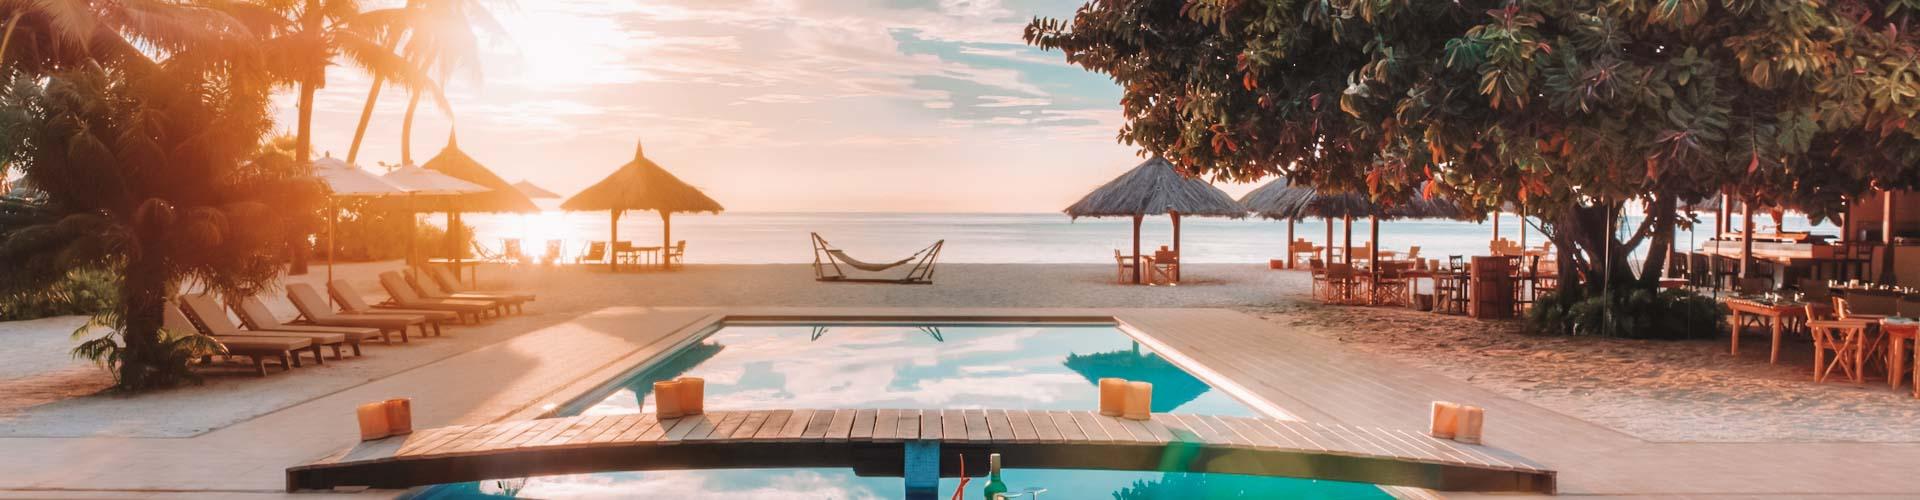 Luxury Resort Collection